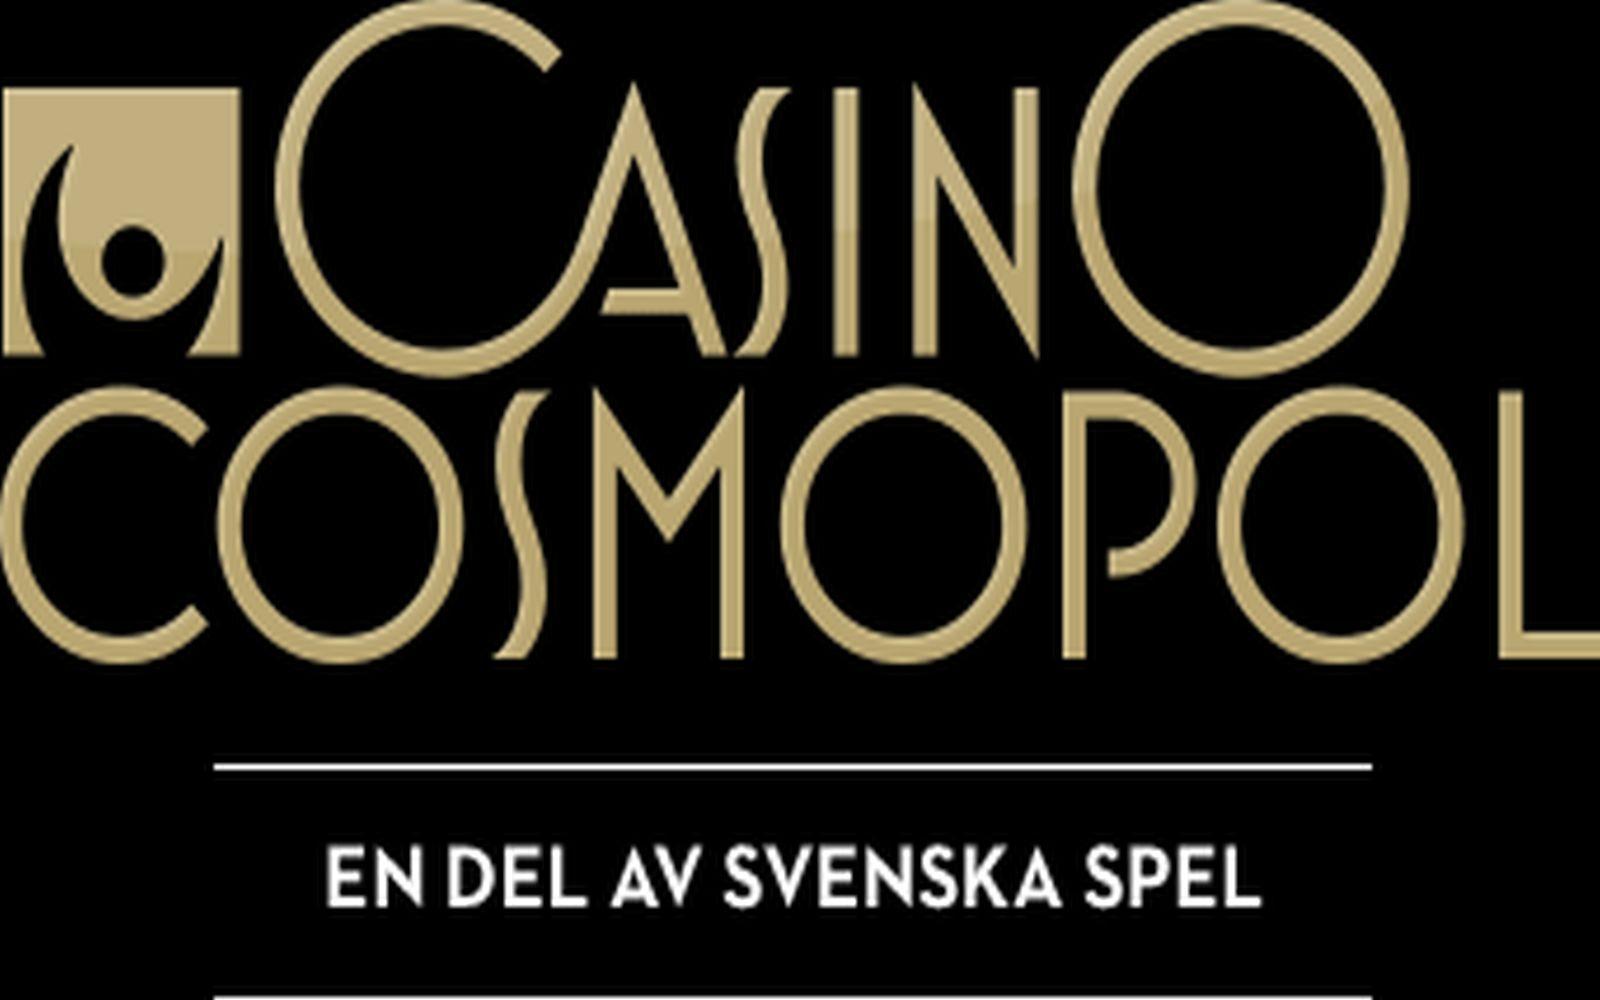 Cosmopol Stockholm